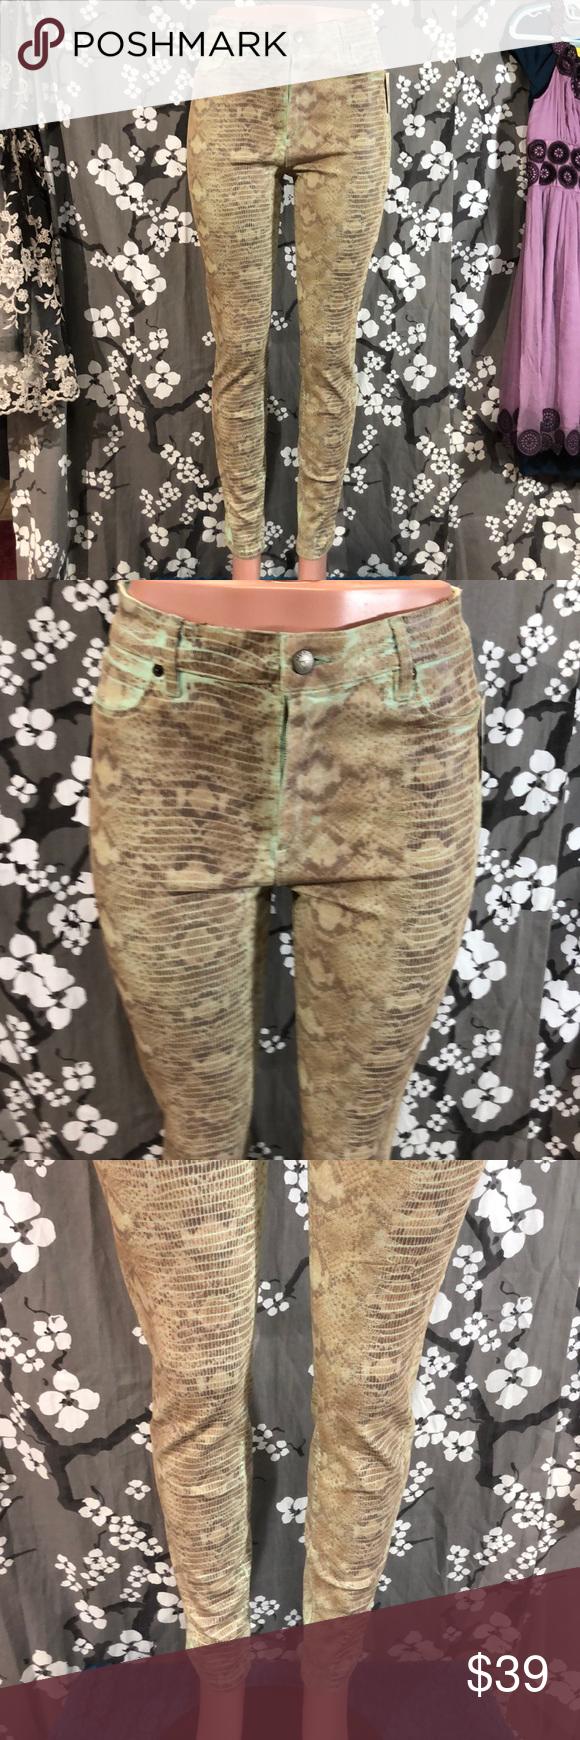 Nwt Guess 1981 Power Skinny Snake Foil Jeans Womens Jeans Skinny Skinny Women Shopping